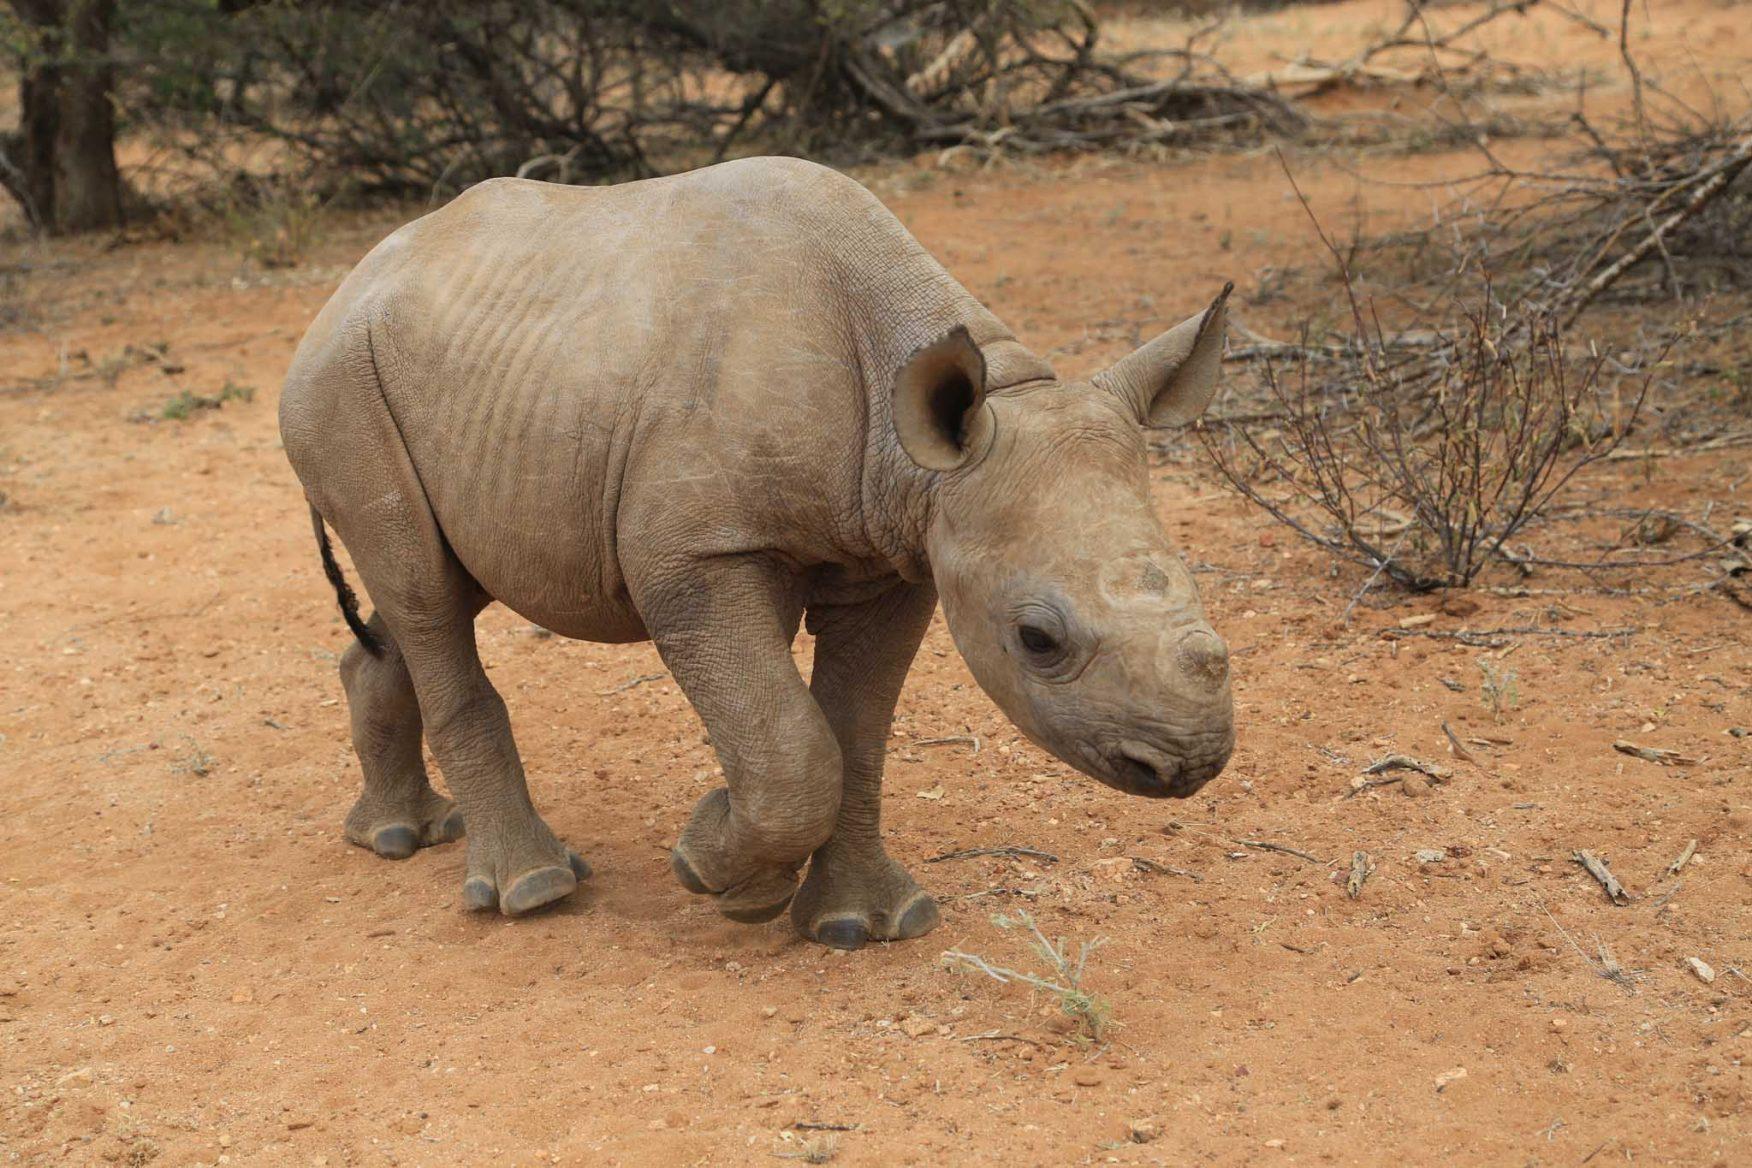 rhino-conservation-11-baby-rhino